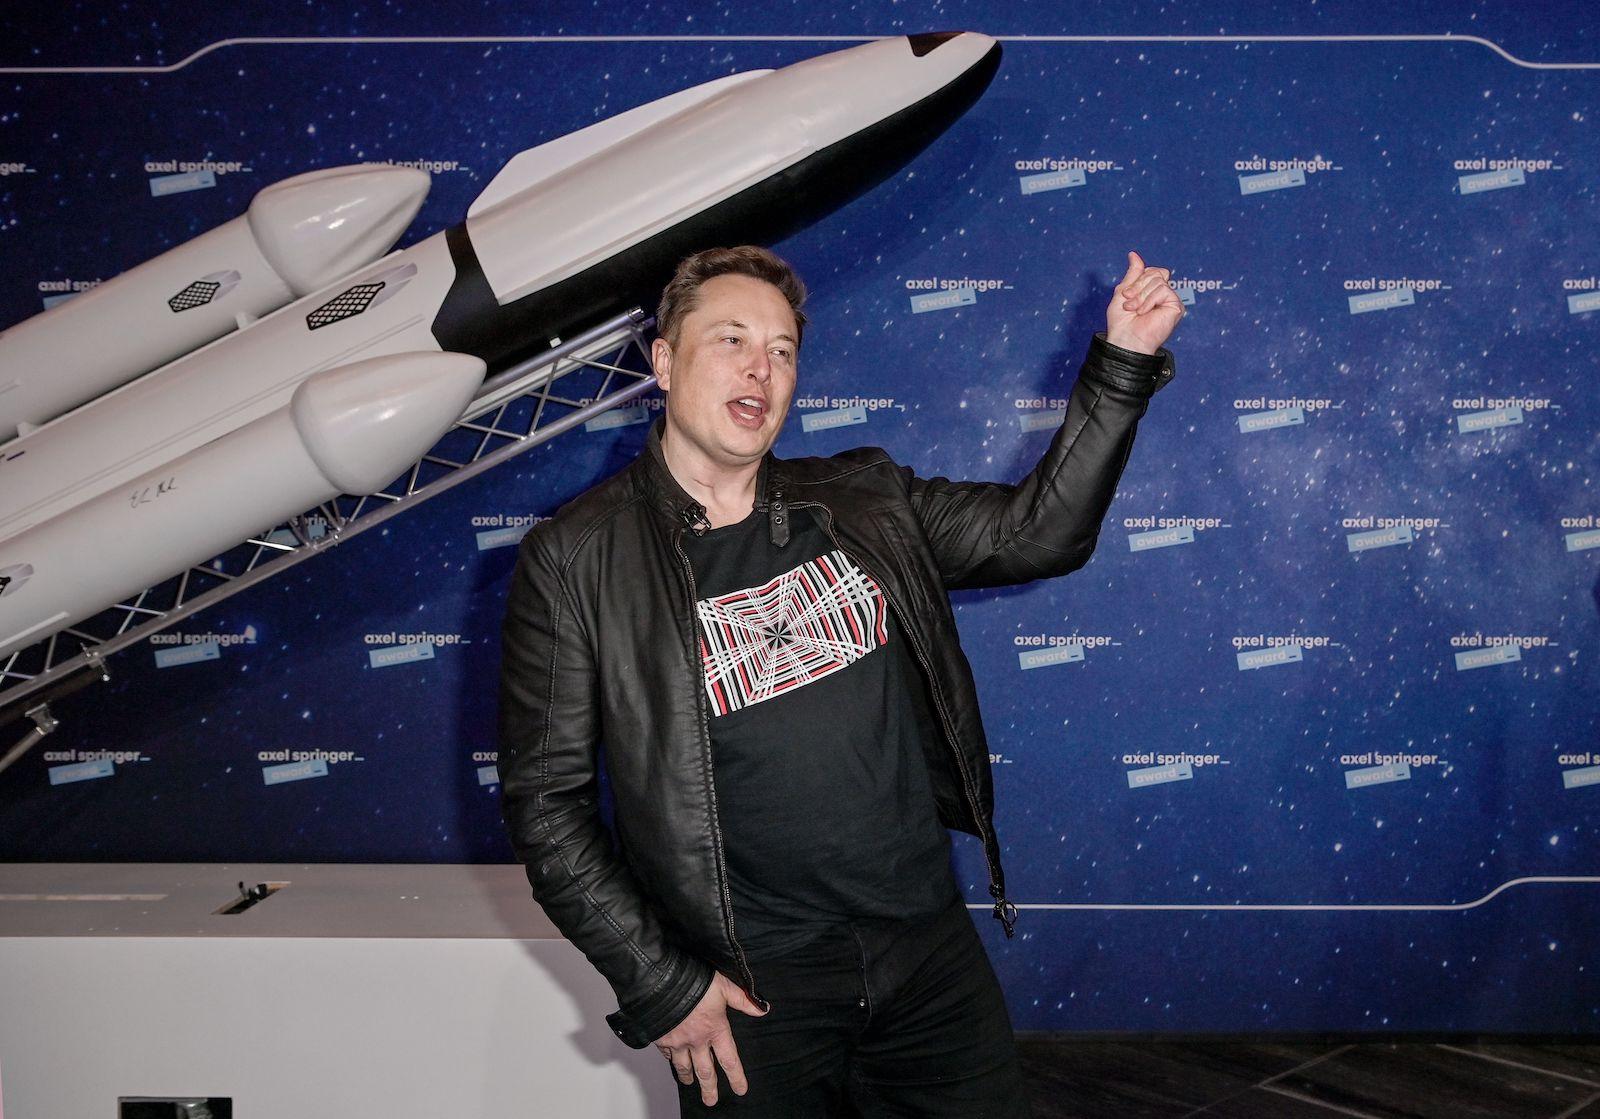 SpaceX 所有者兼特斯拉首席執行官埃隆馬斯克 (R) 於 2020 年 12 月 1 日抵達柏林參加阿克塞爾斯普林格頒獎典禮的紅地毯時示意。(攝影:Britta Pedersen / POOL / AFP)(攝影:BRITTA PEDERSEN/池/法新社通過蓋蒂圖片)